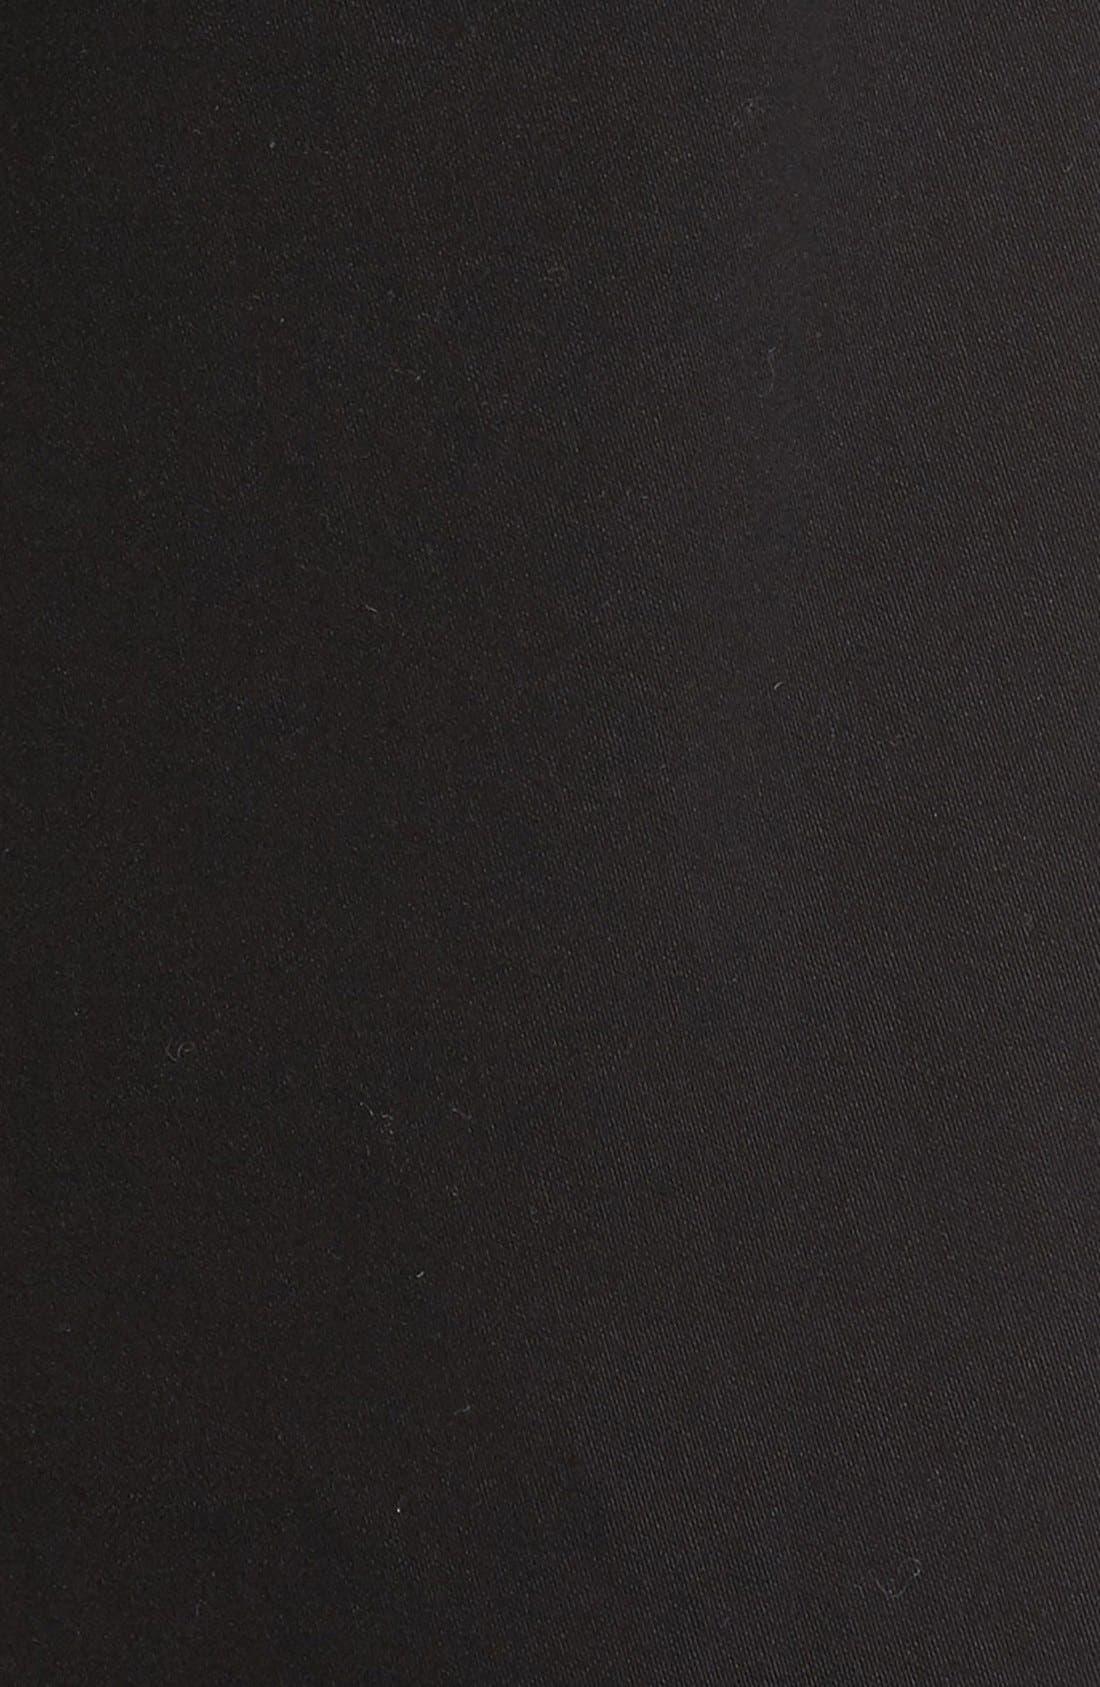 Dylan Slim Fit Pants,                             Alternate thumbnail 6, color,                             010